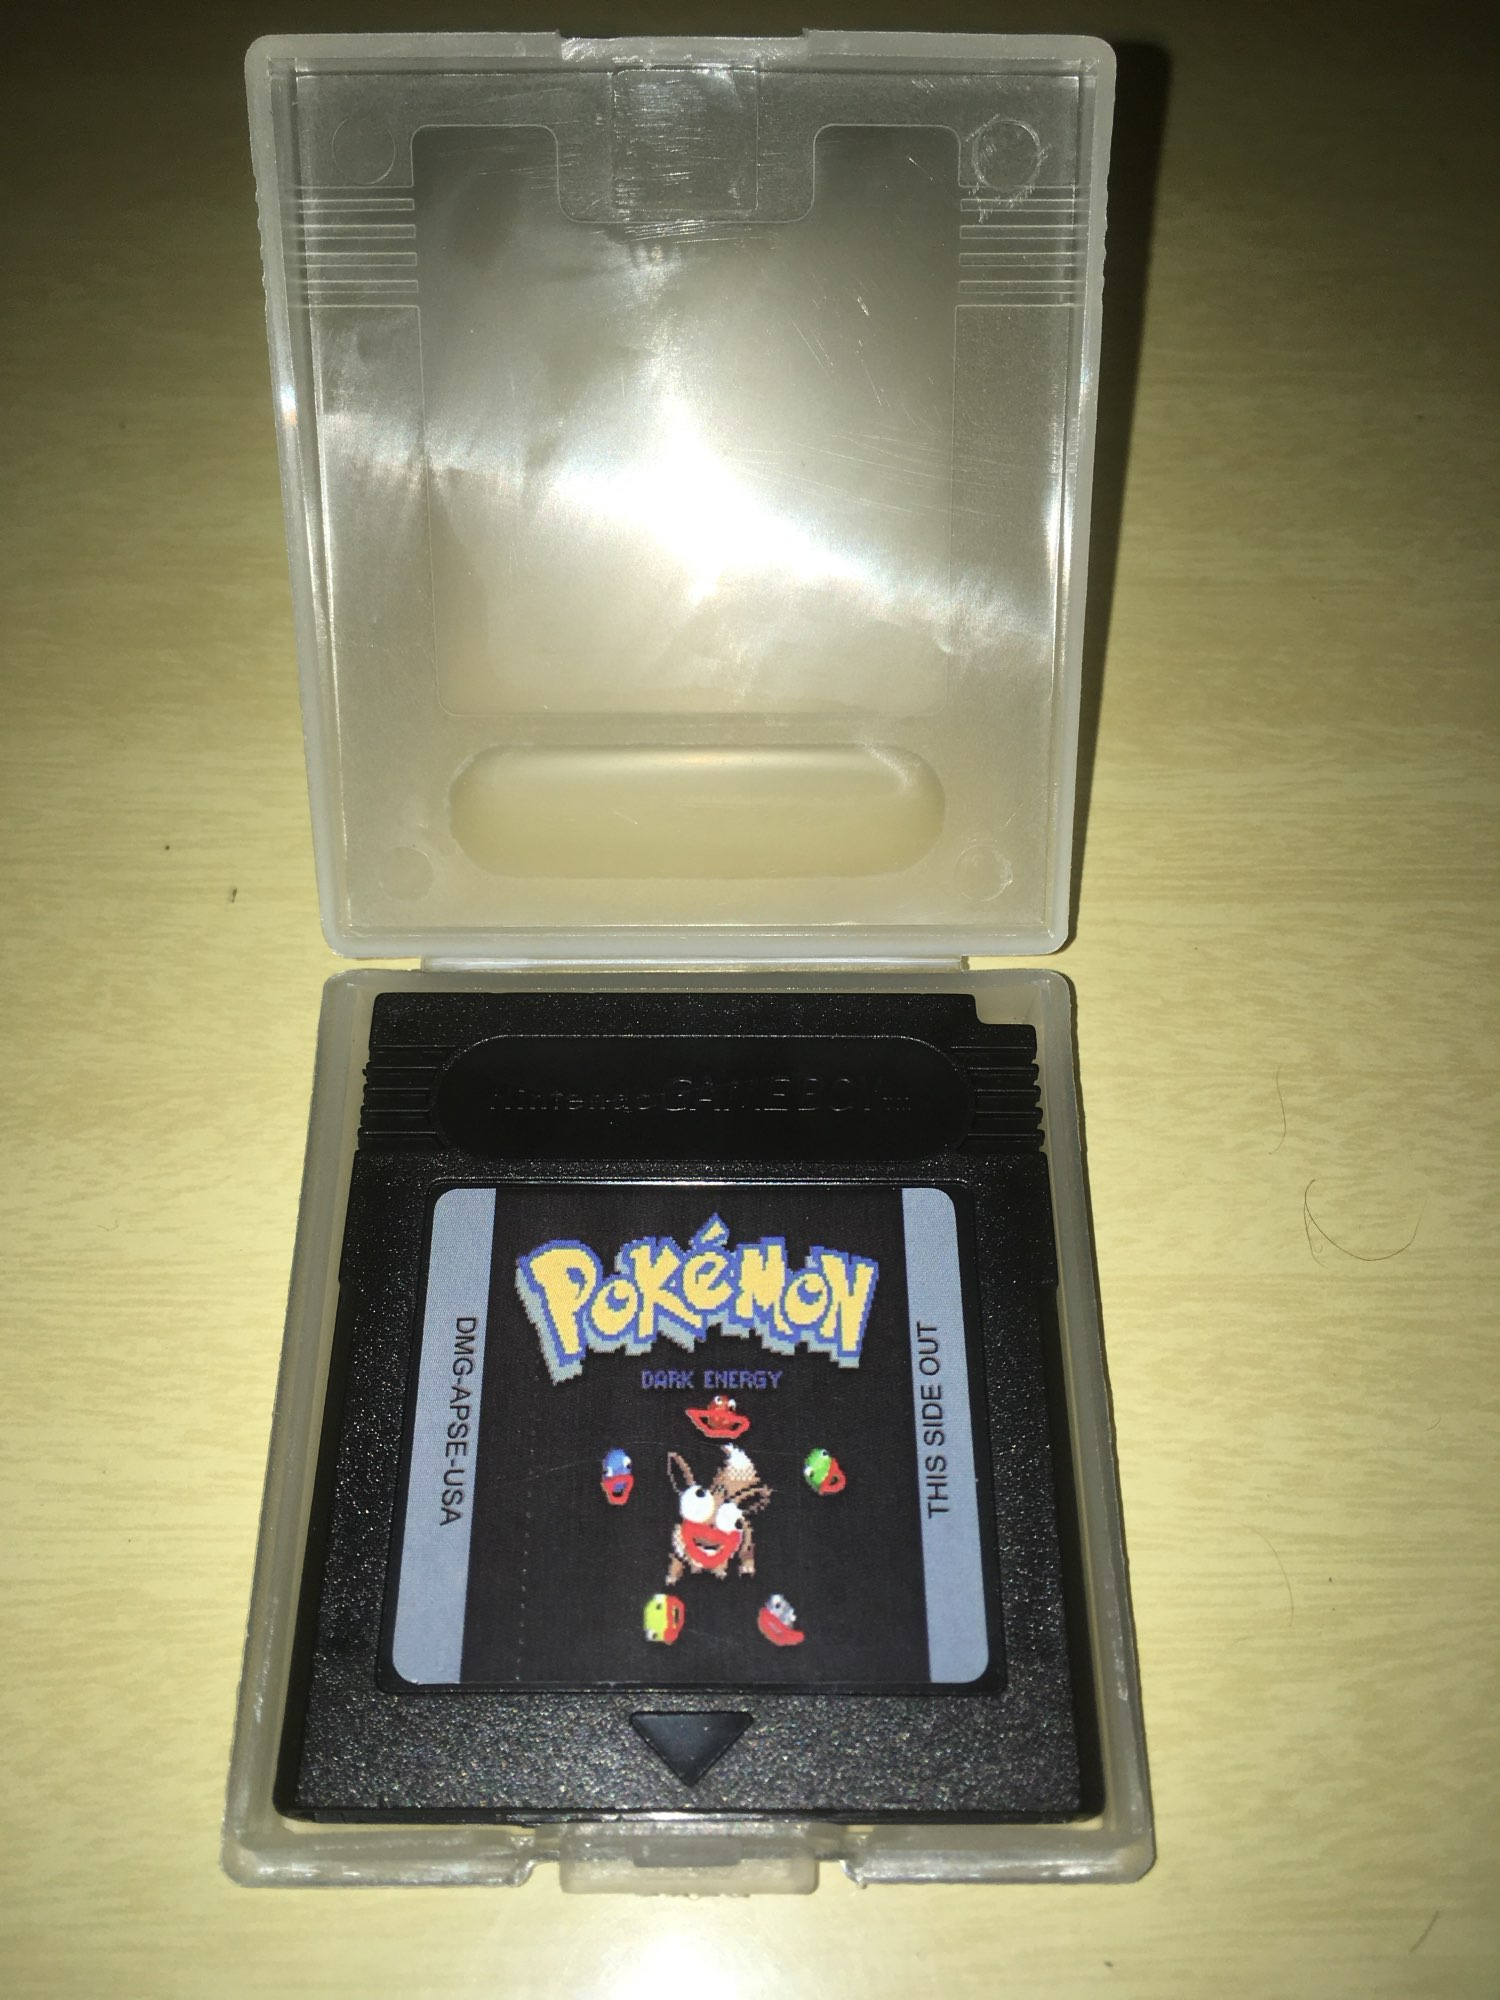 For Nintendo GBC Video Game Cartridge Console Card Poke Series Dark Energy English Language Version photo review